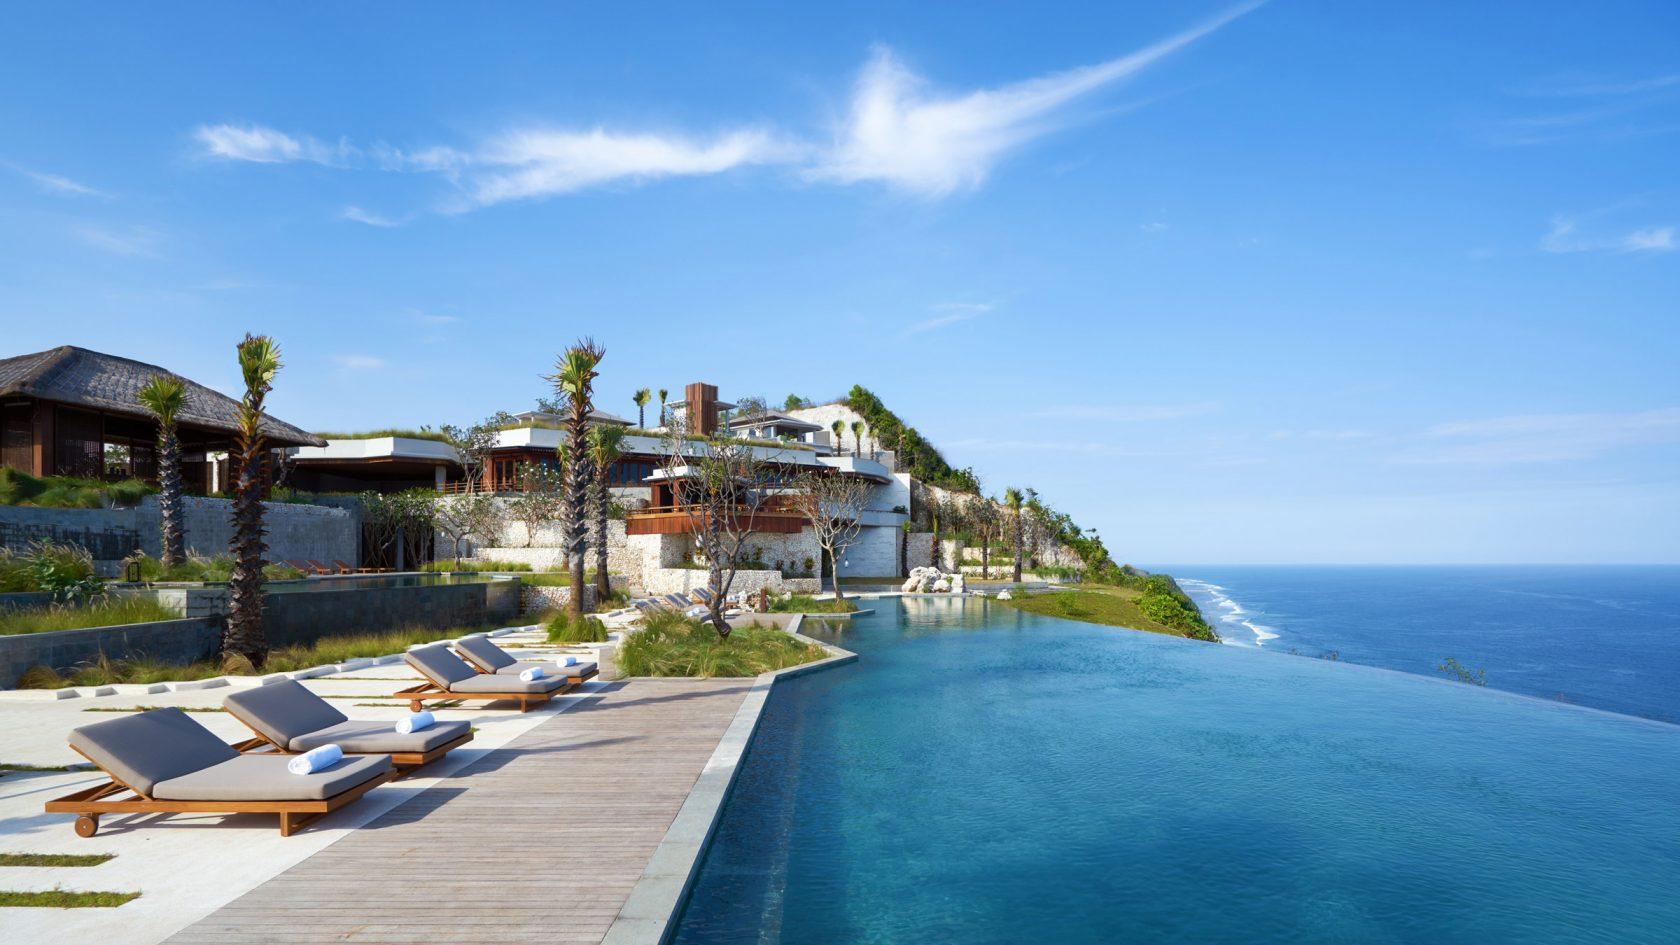 Luxushotel Six Senses Uluwatu Bali buchen